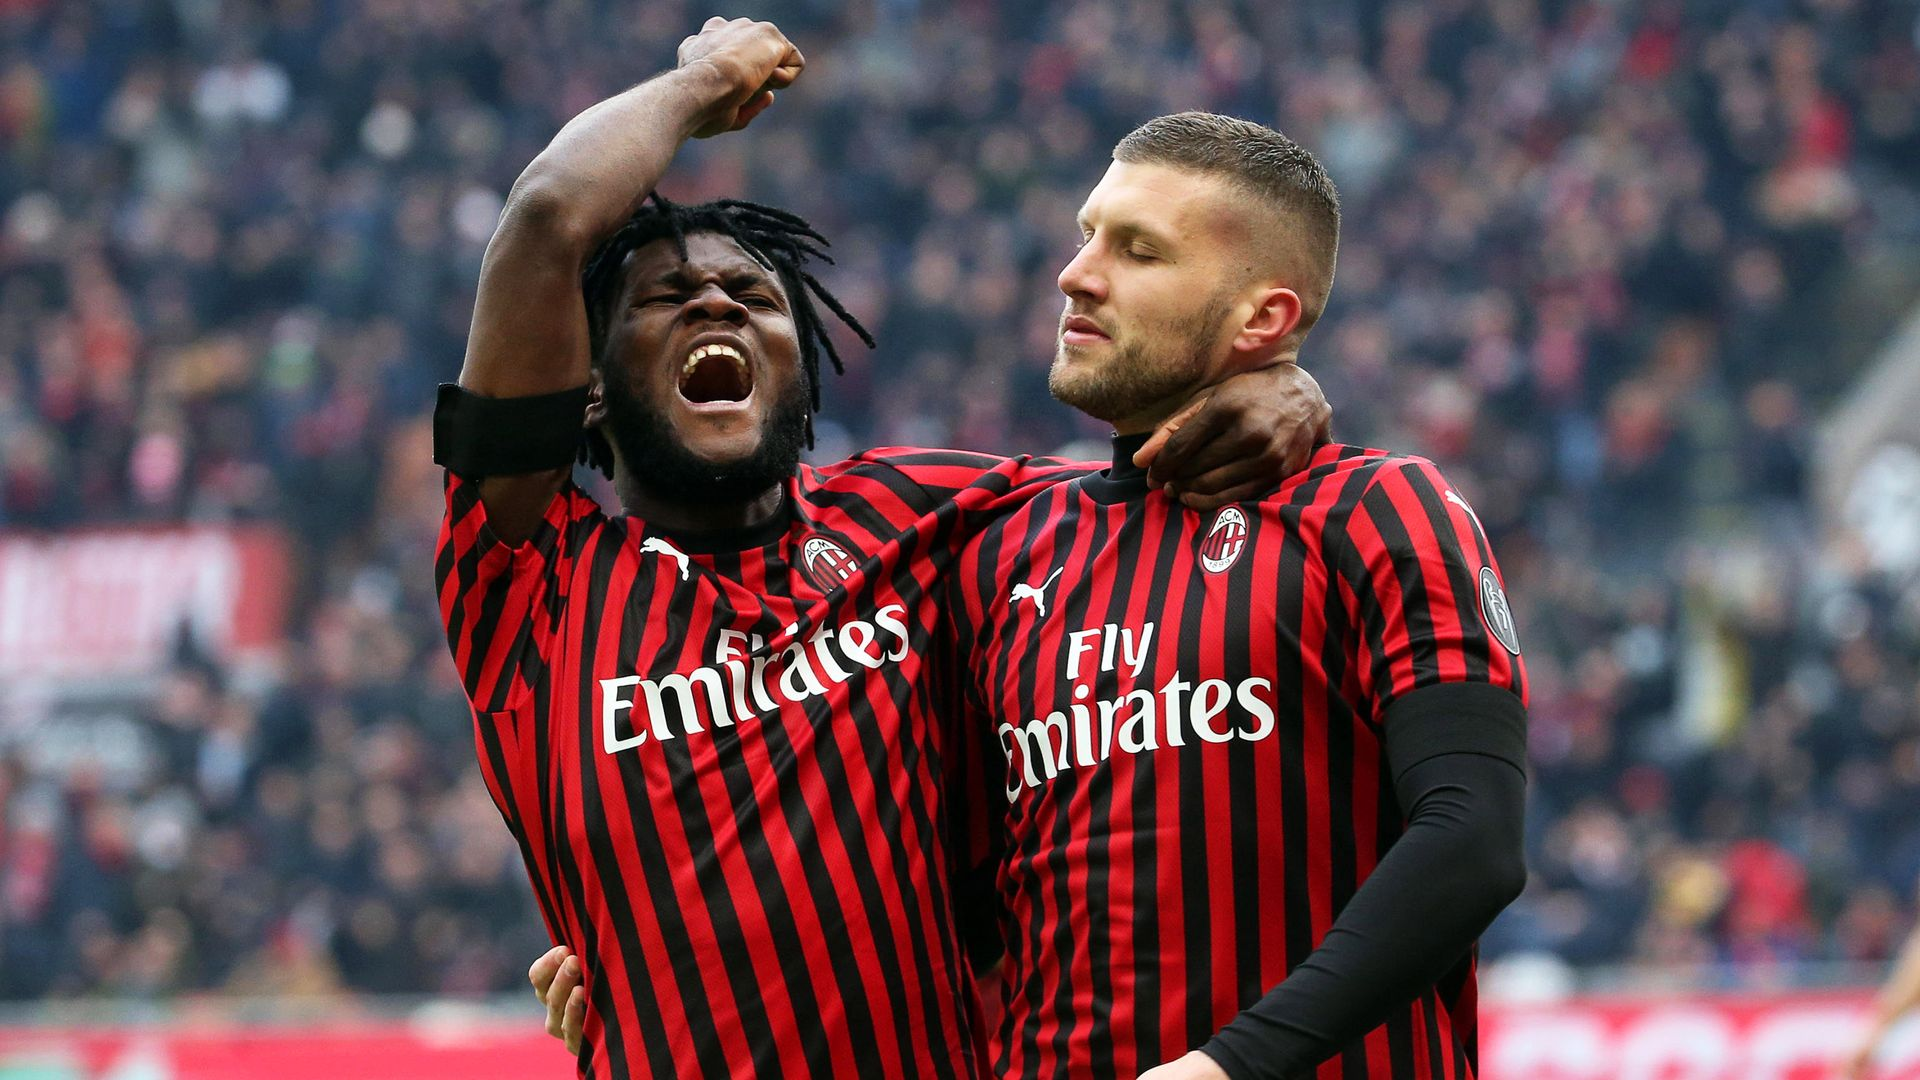 Serie A : l'AC Milan revient de loin, la Sampdoria s'amuse